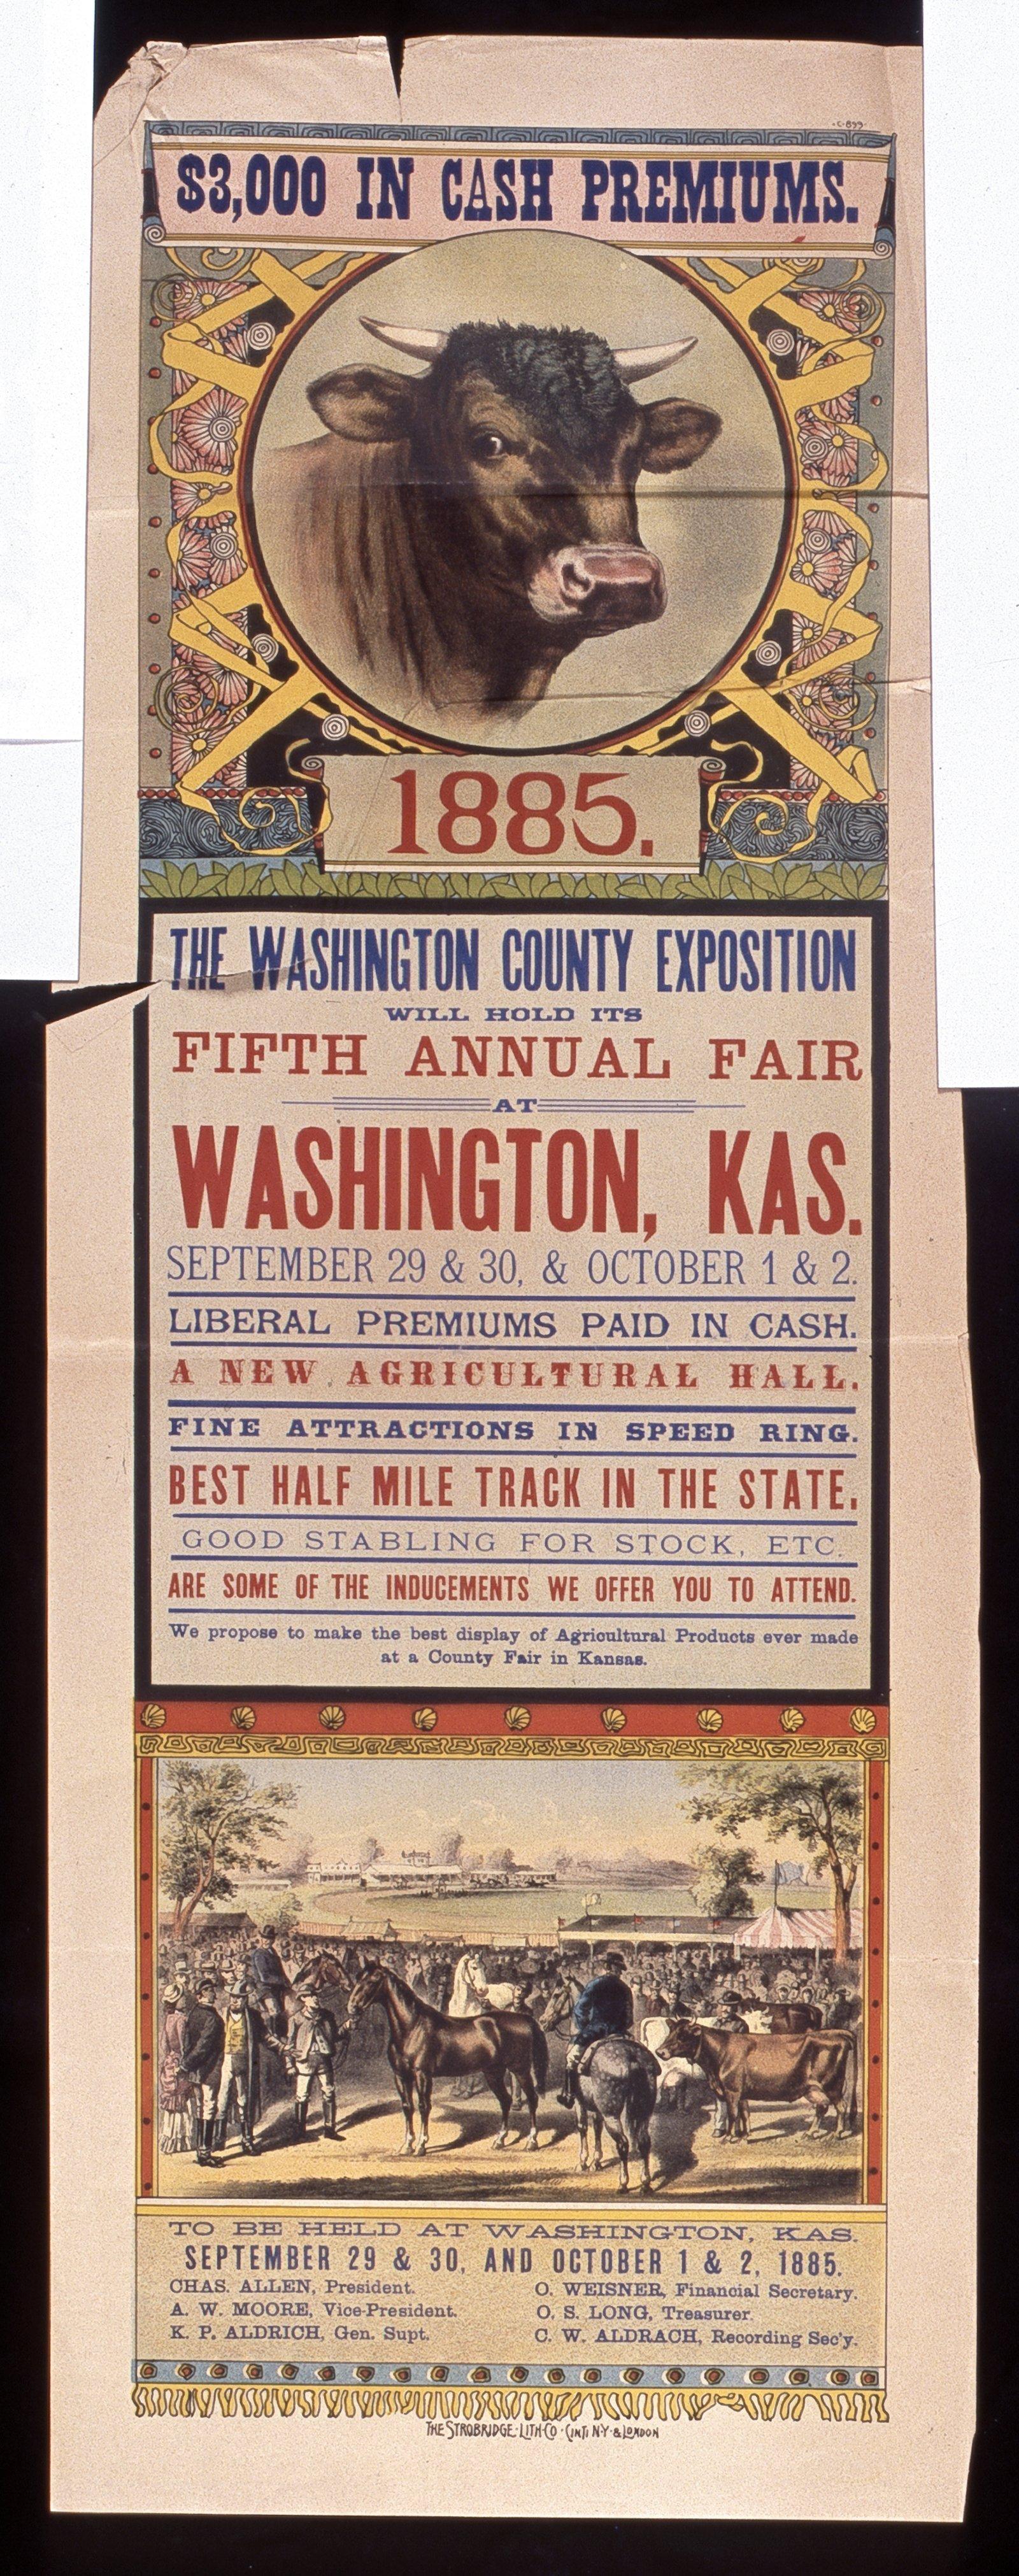 Fifth annual Washington County exposition